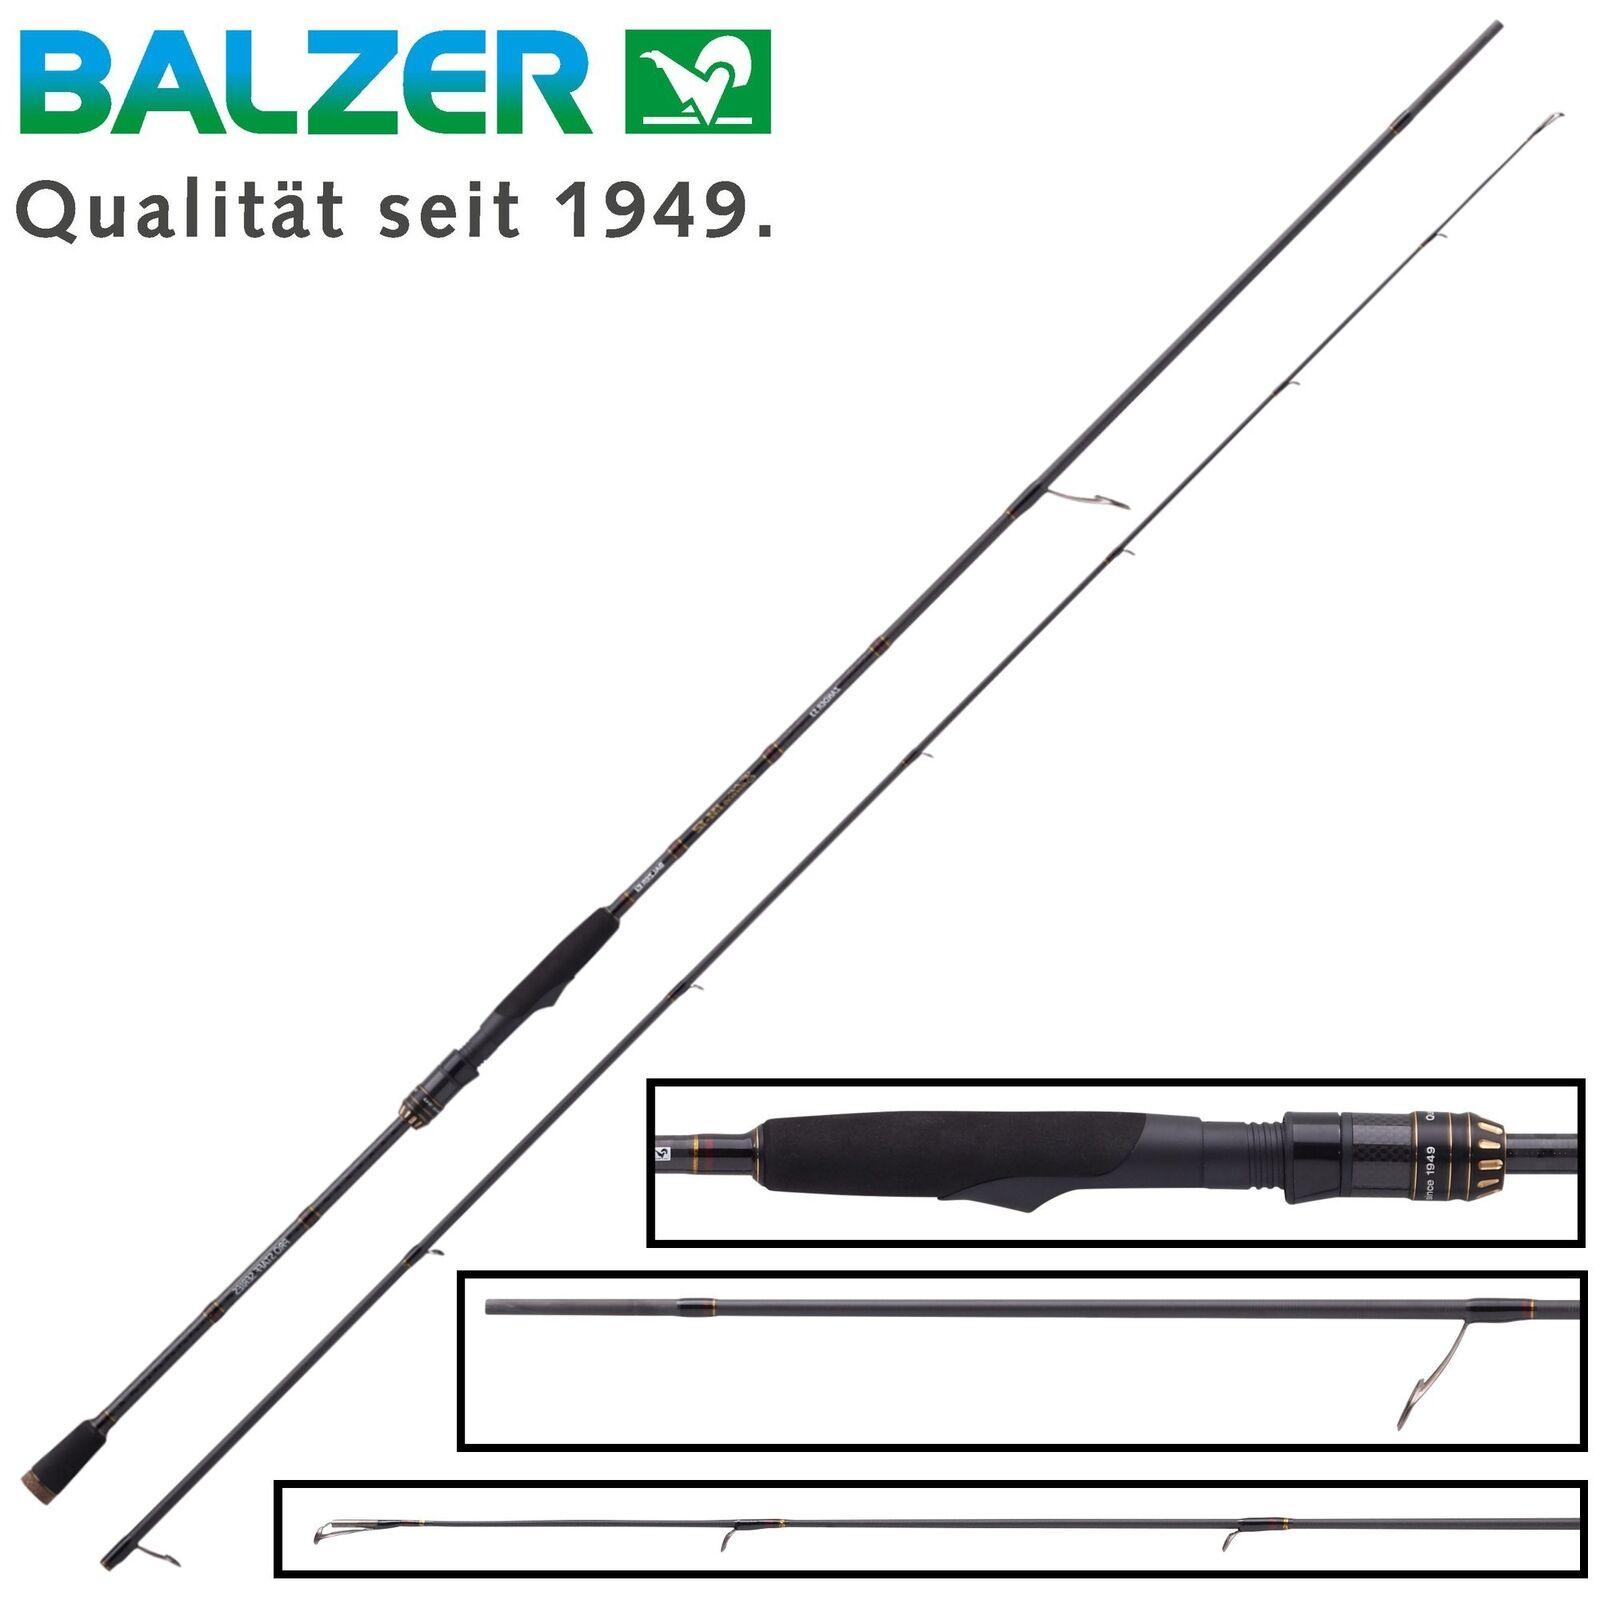 Balzer IM-12 Zander 53 2,42m 21-53g - Spinnrute, Zanderrute, Jigrute, Angelrute